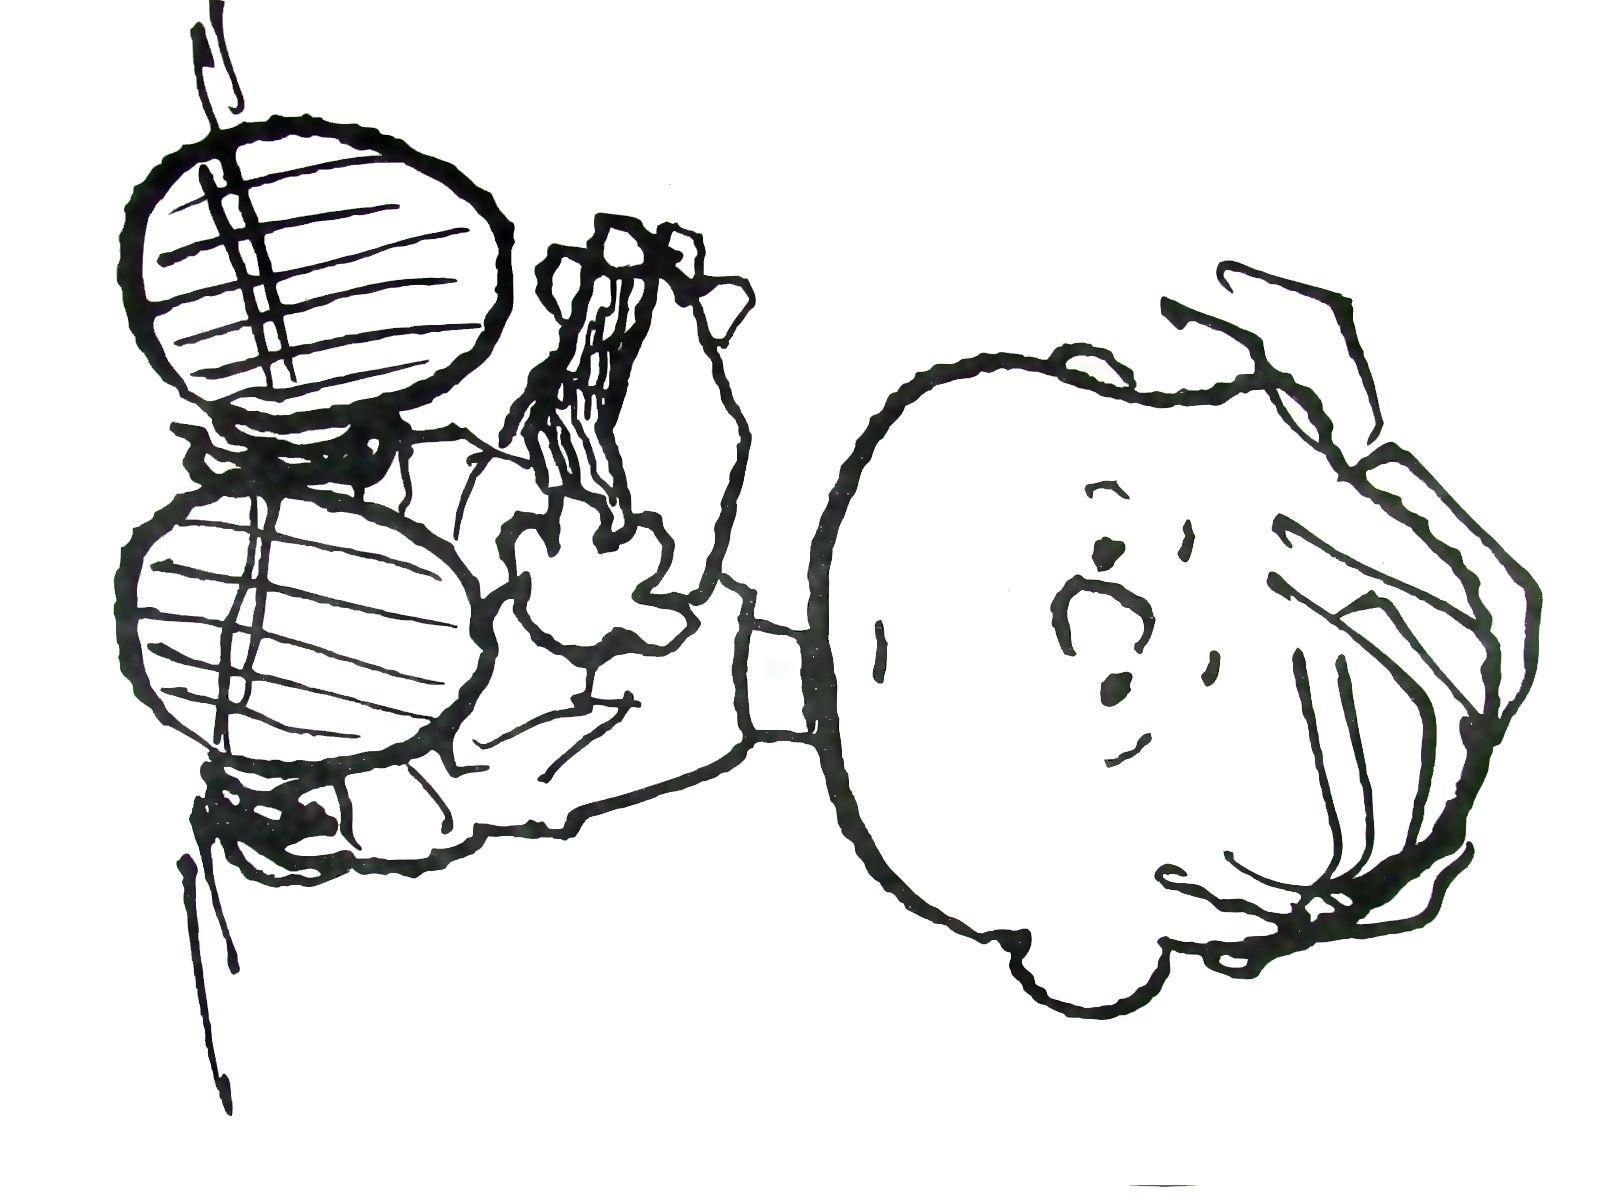 linus peanuts gang coloring book page printable - Peanuts Coloring Book